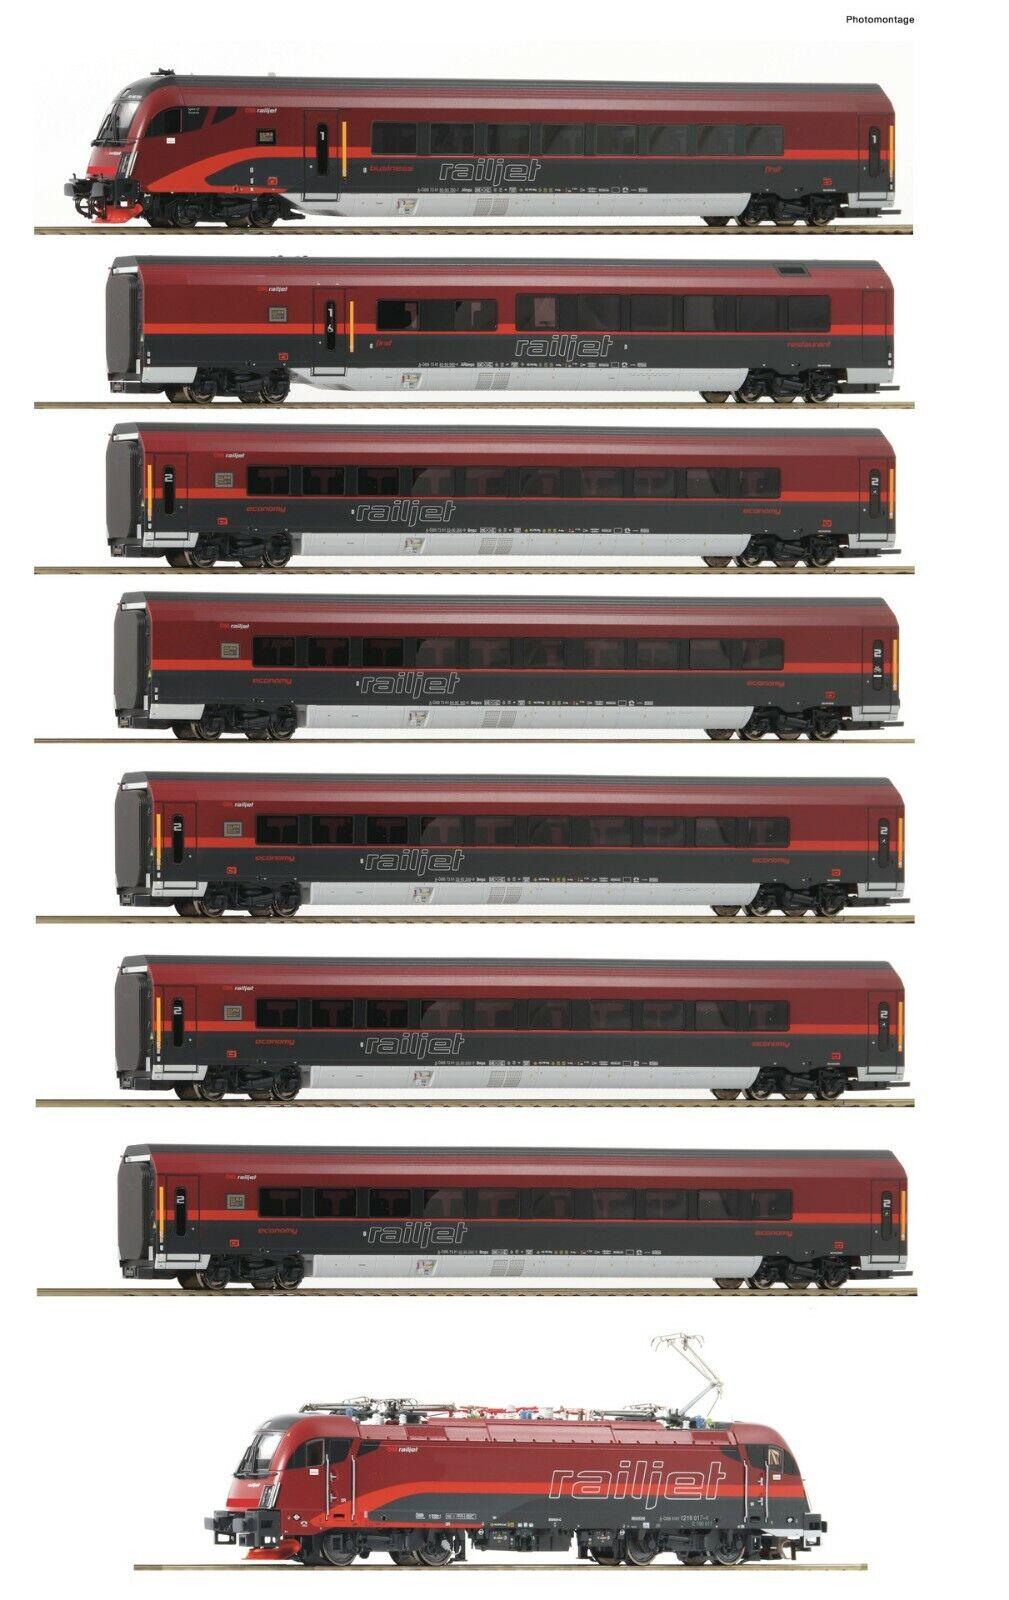 Nuova lista ROCO 74116 8 Piece Set     Railjet , ÖBB Digital Luce Suono Nuovo  vendita di fama mondiale online